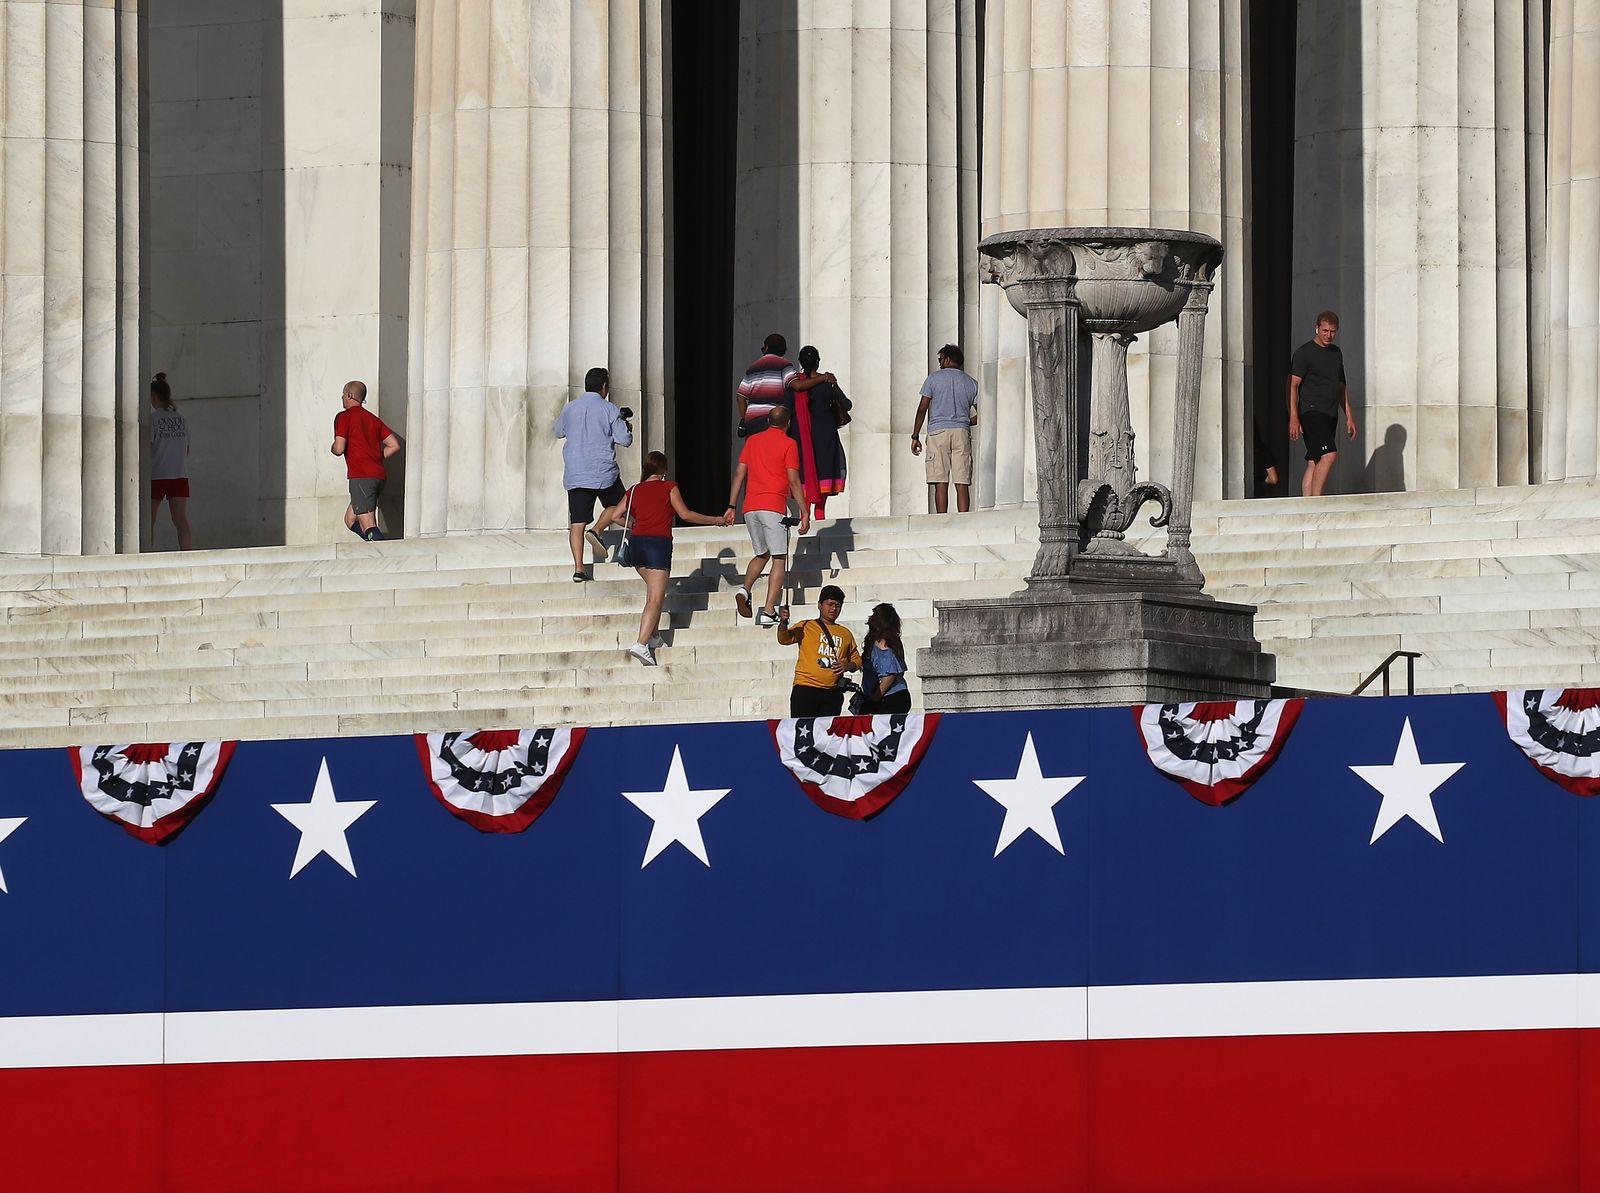 US-WASHINGTON-PREPARES-FOR-PRESIDENT-TRUMPS-FOURTH-OF-JULY-CELE